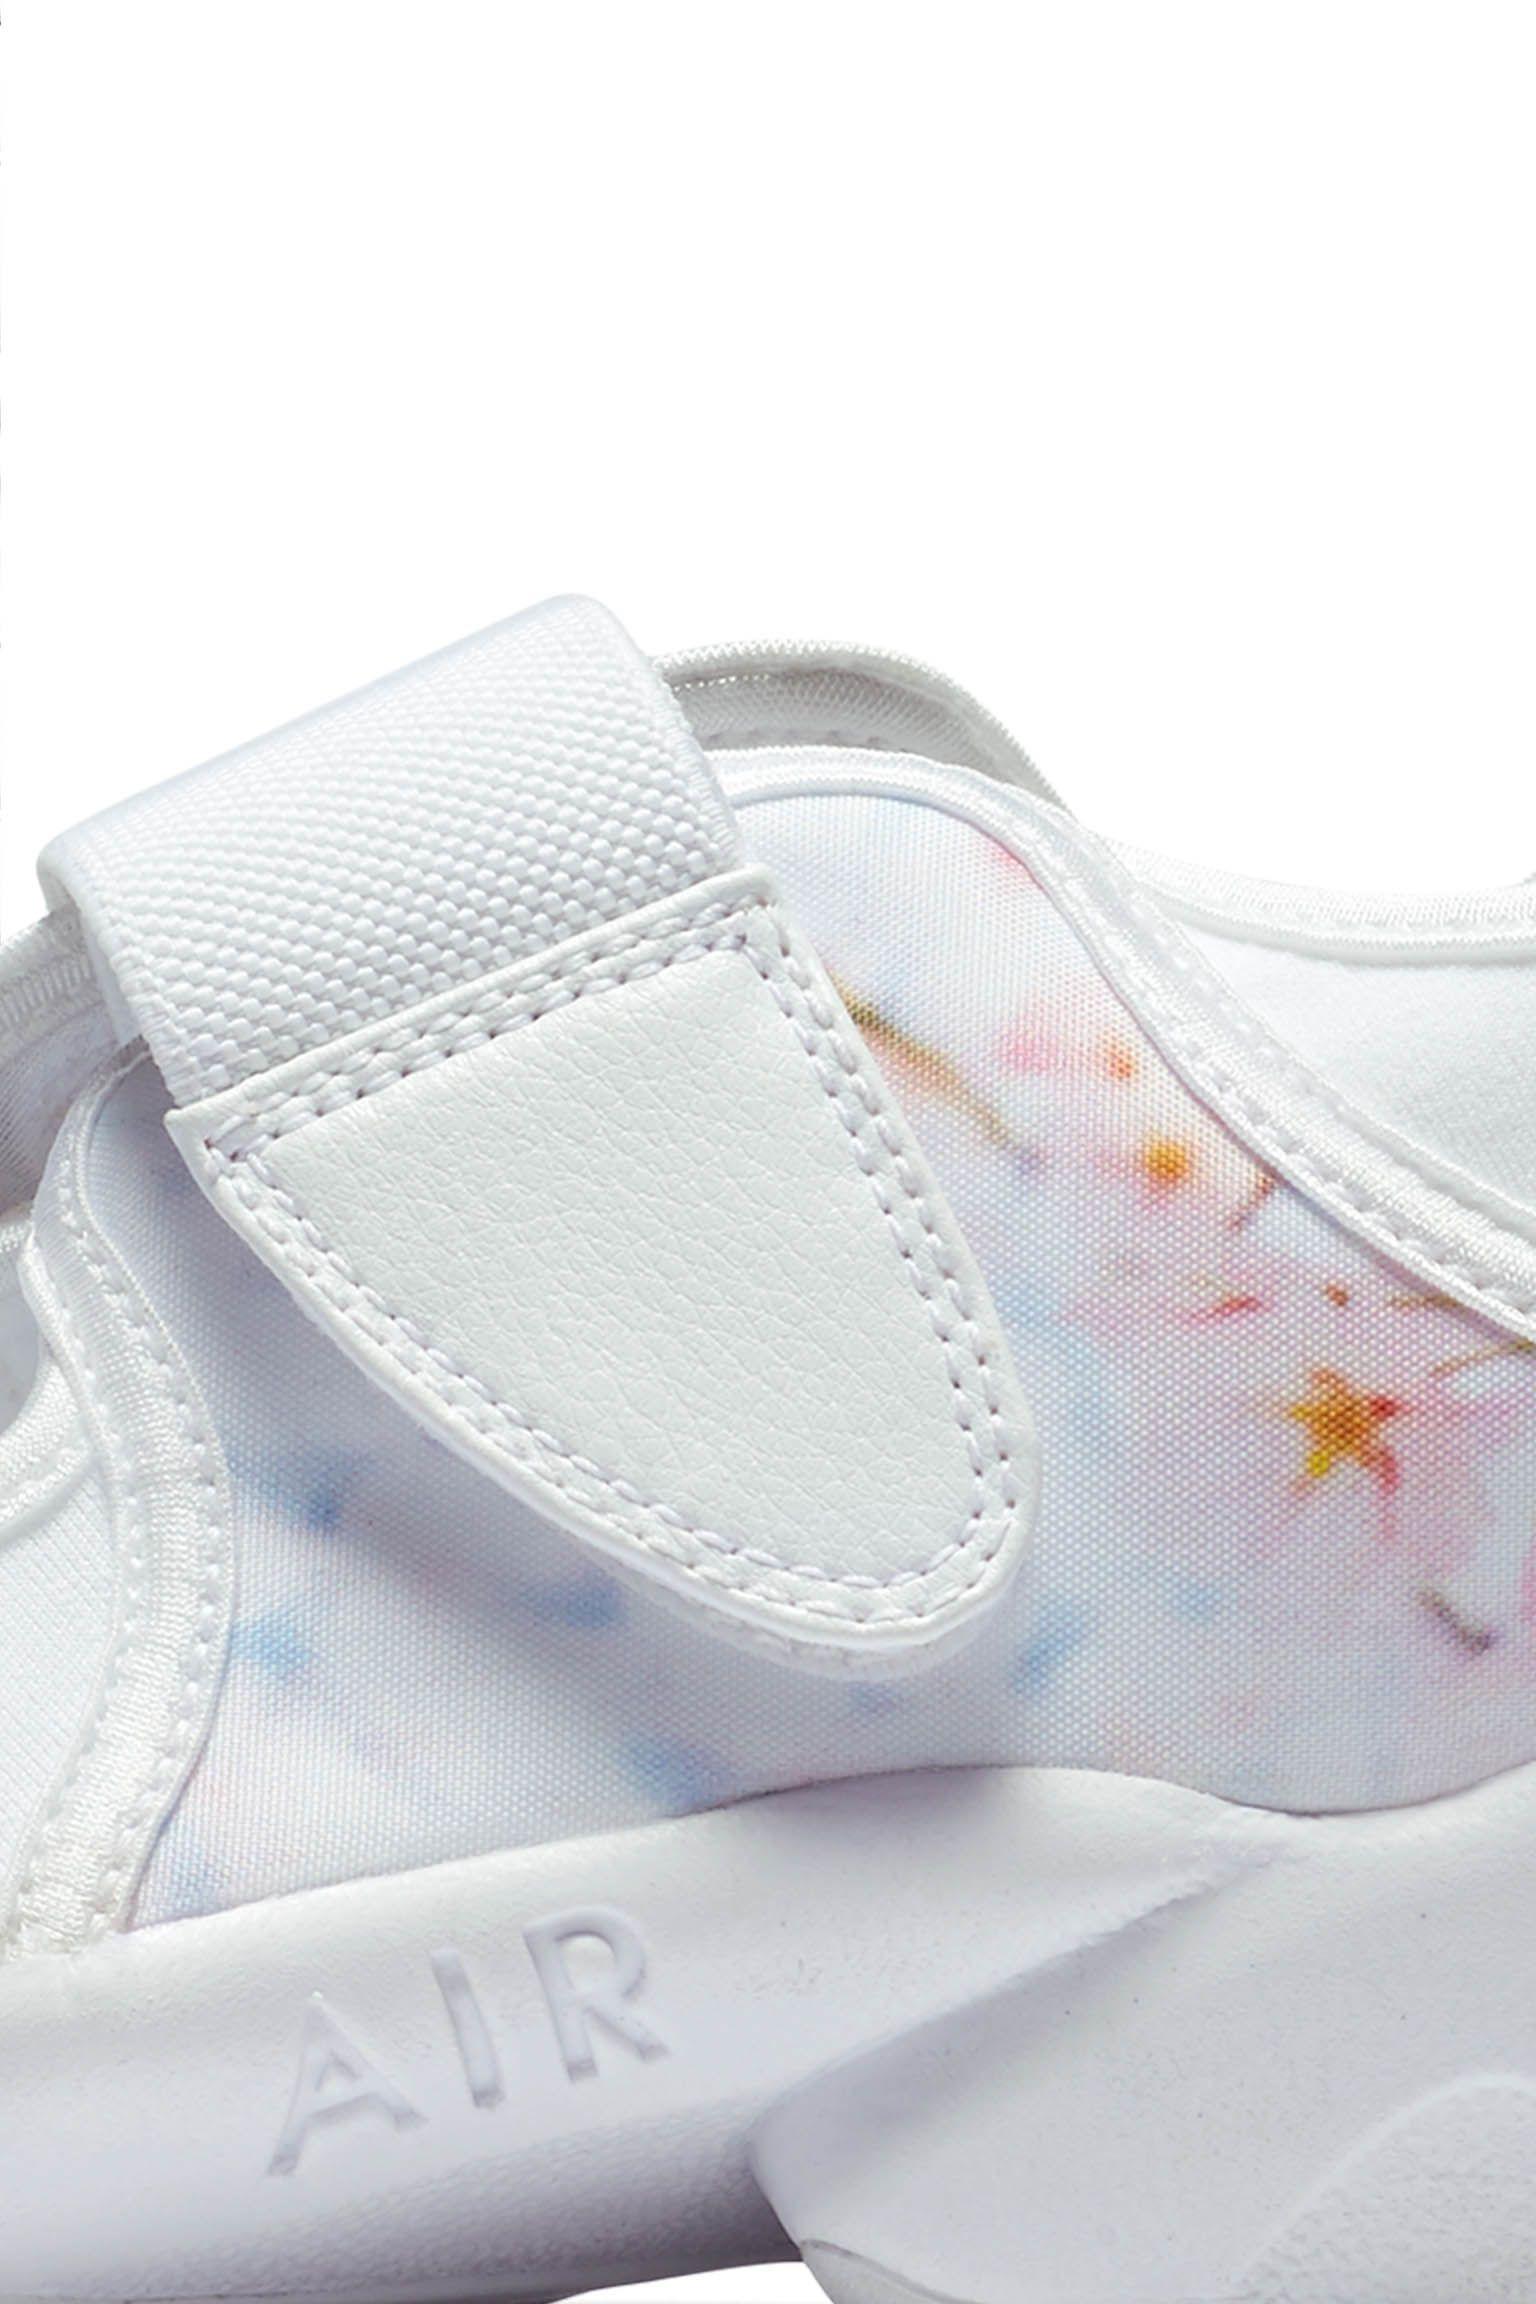 Women's Nike Air Rift 'Cherry Blossom'